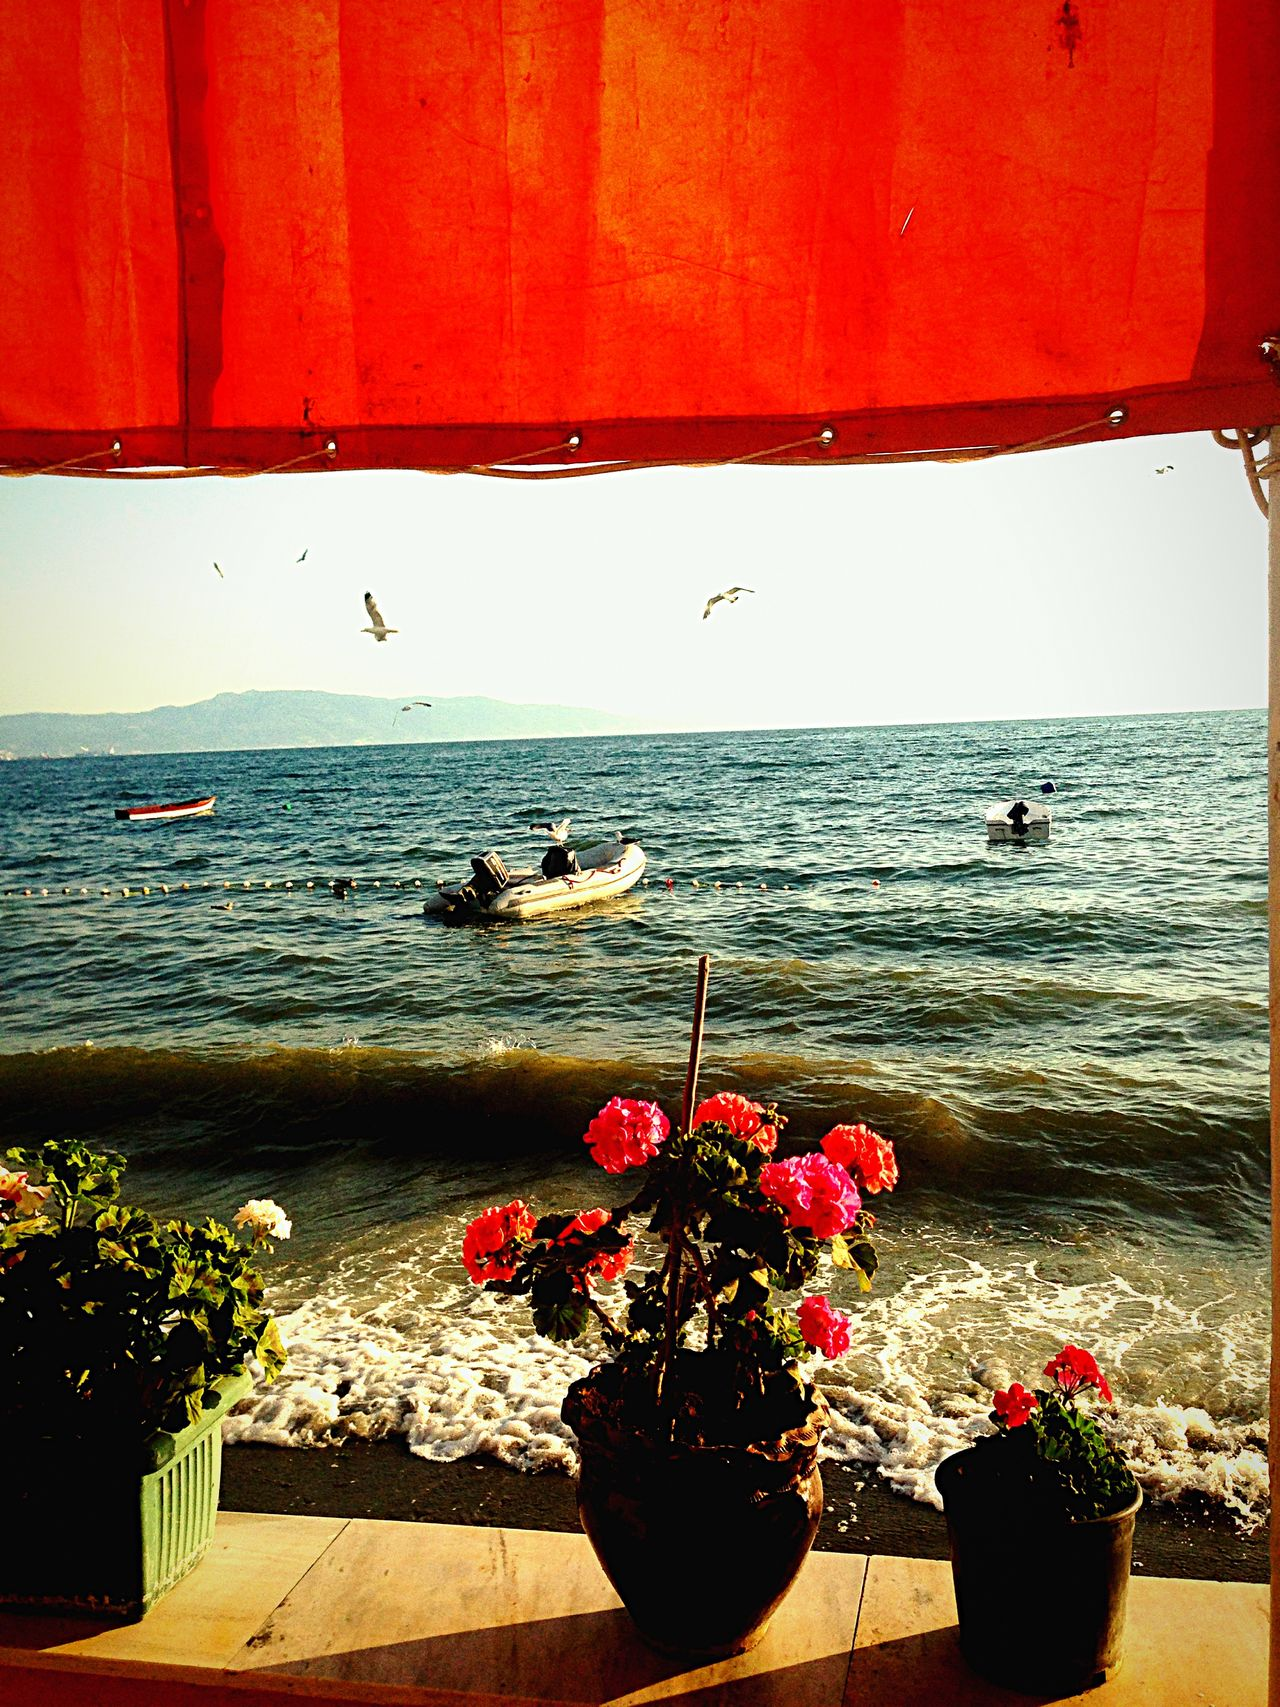 Enjoying The Sun Sea Relaxing Weekend Hello World Enjoying Life Beautiful Day Marmarasea Flowers